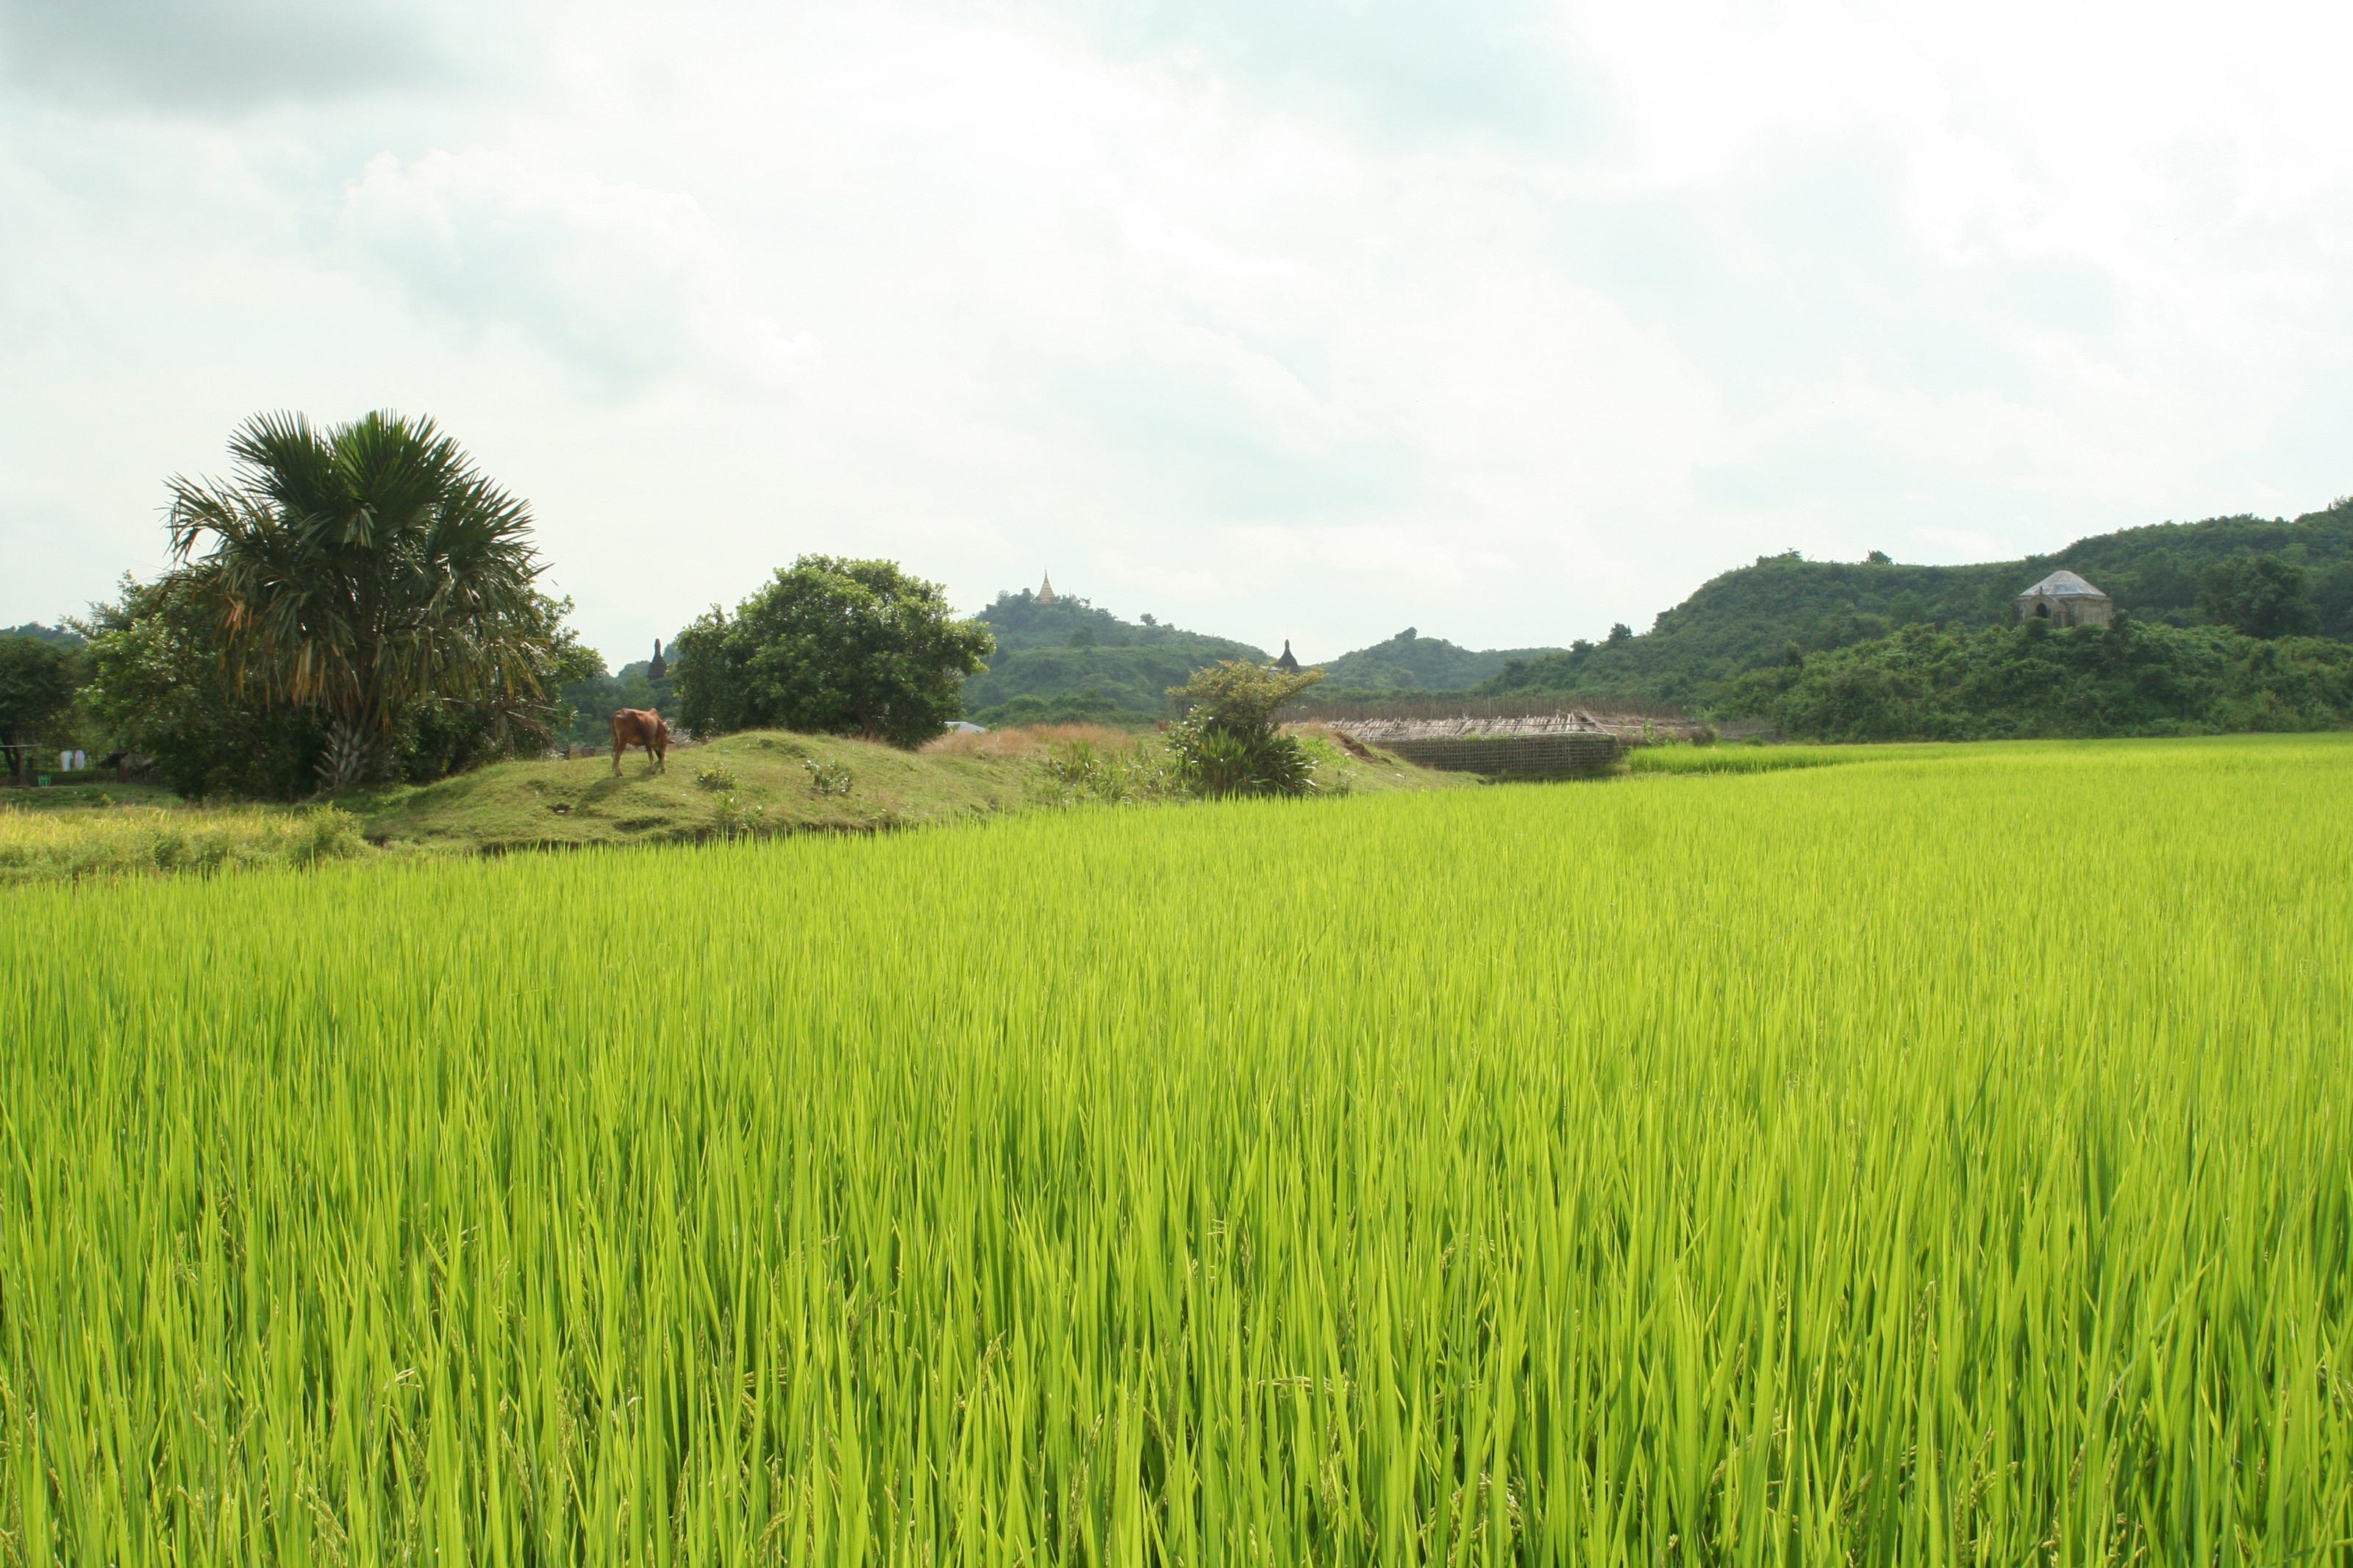 Mrauk U - fields